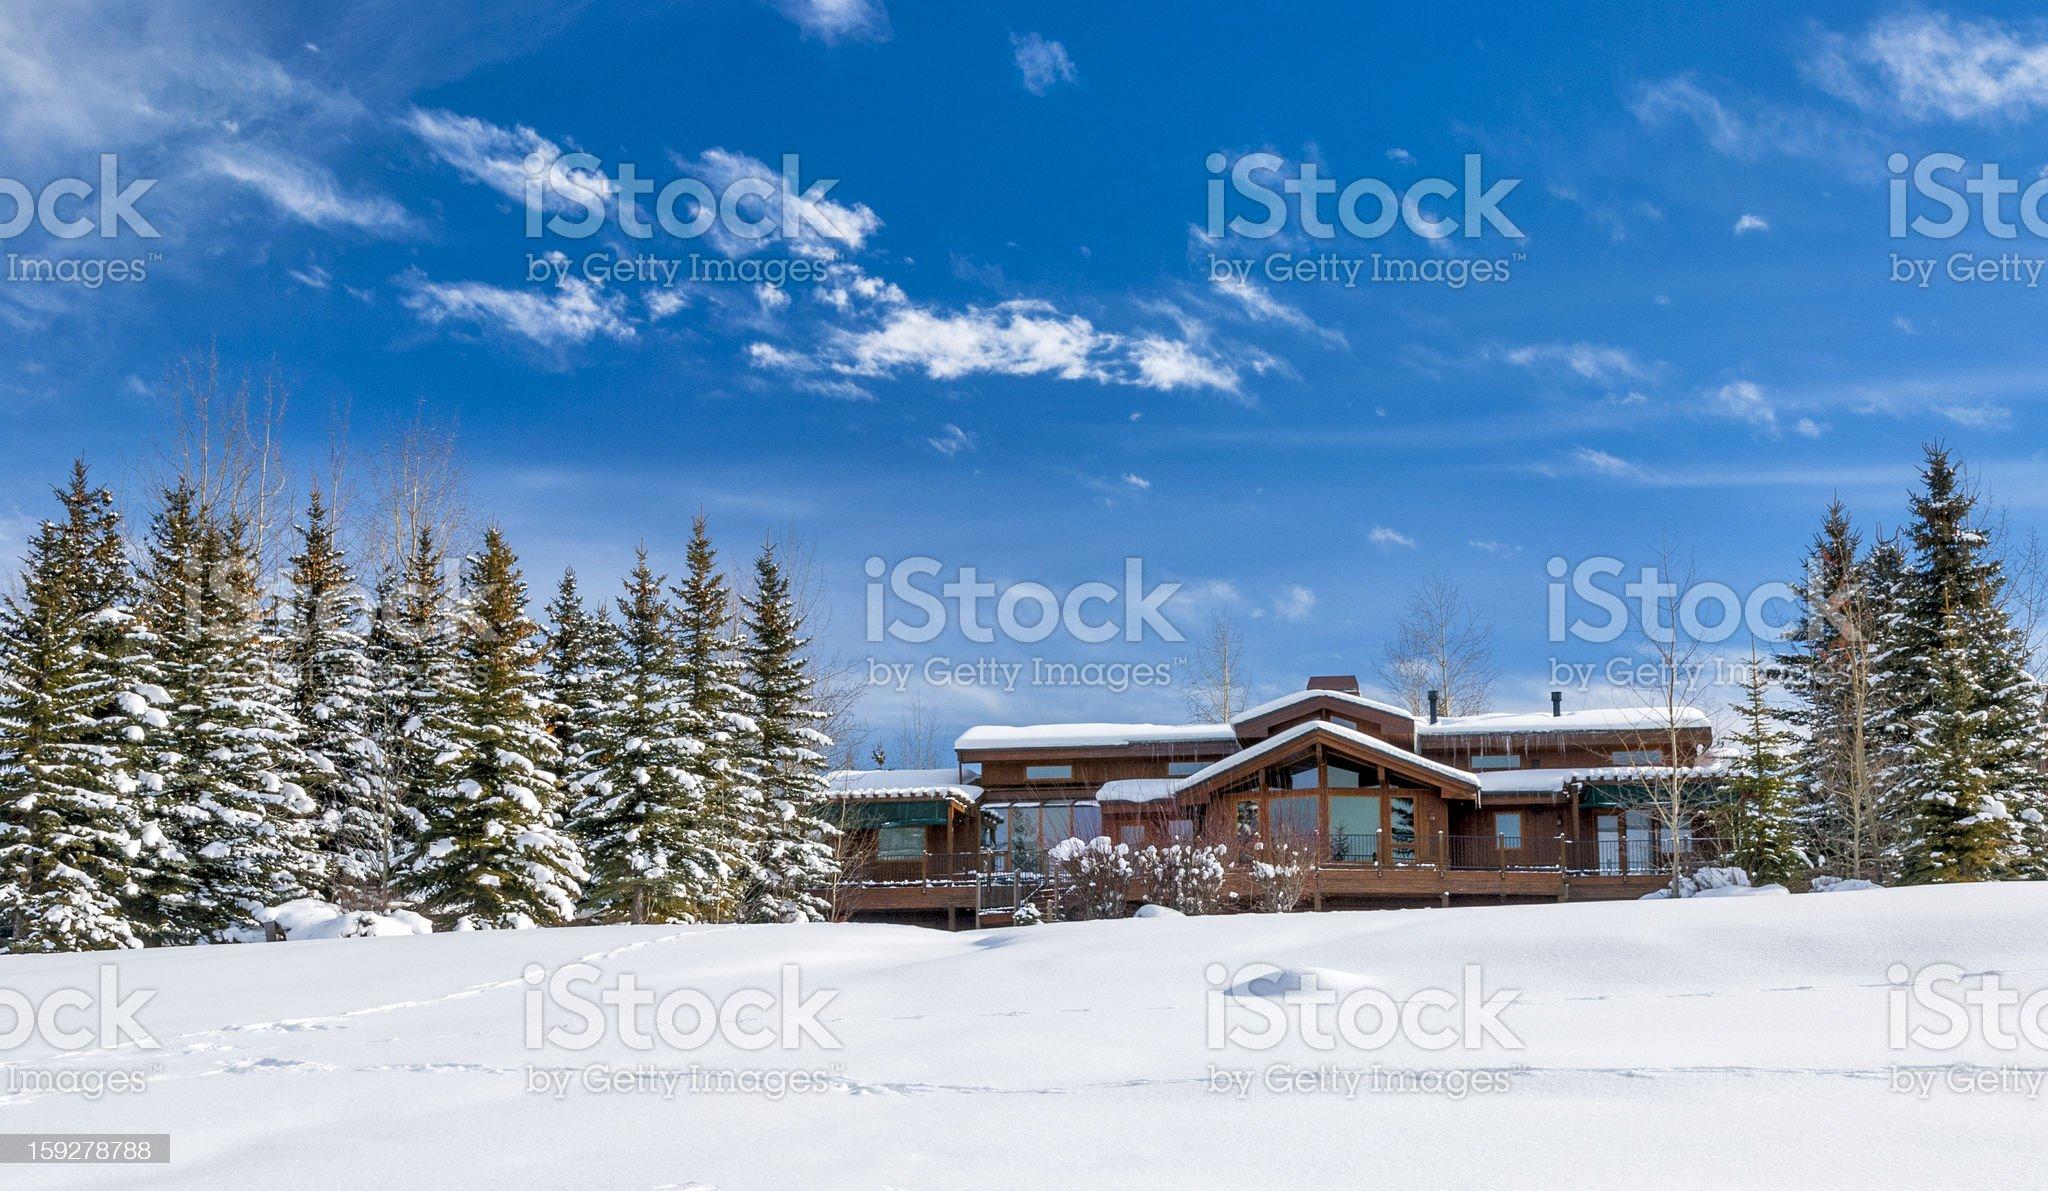 Wooden hounse in the snow winter Idaho royalty-free stock photo